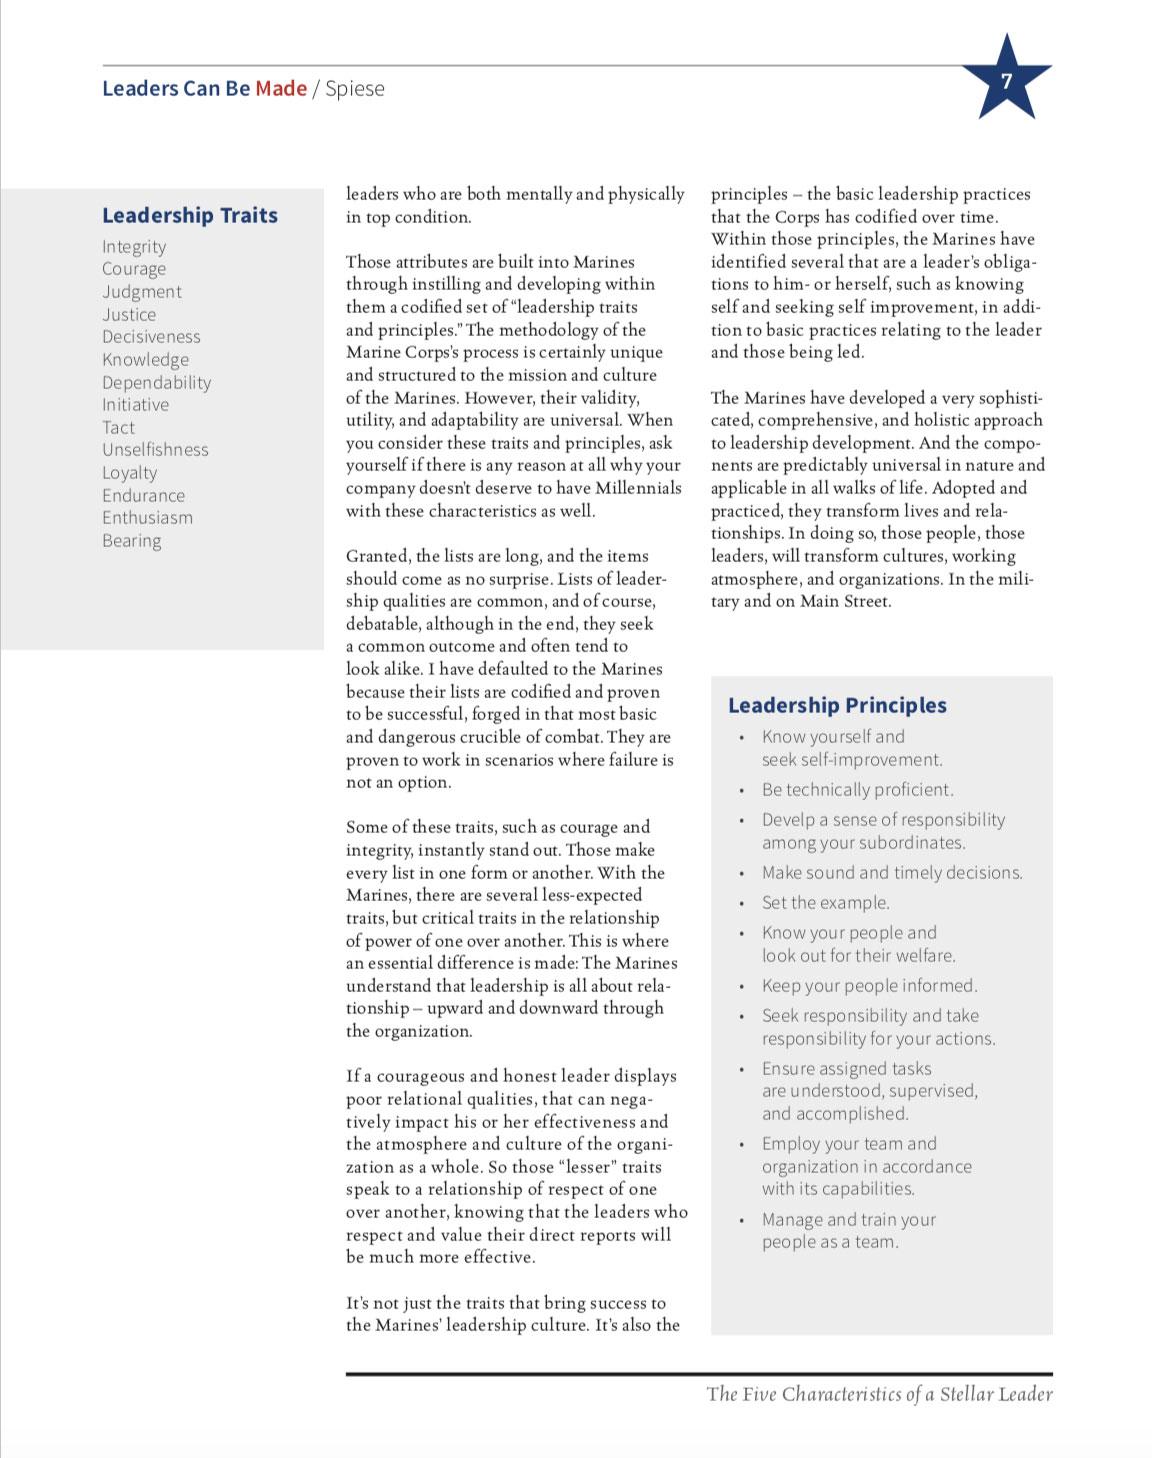 LCBM_eBook-page7.jpg